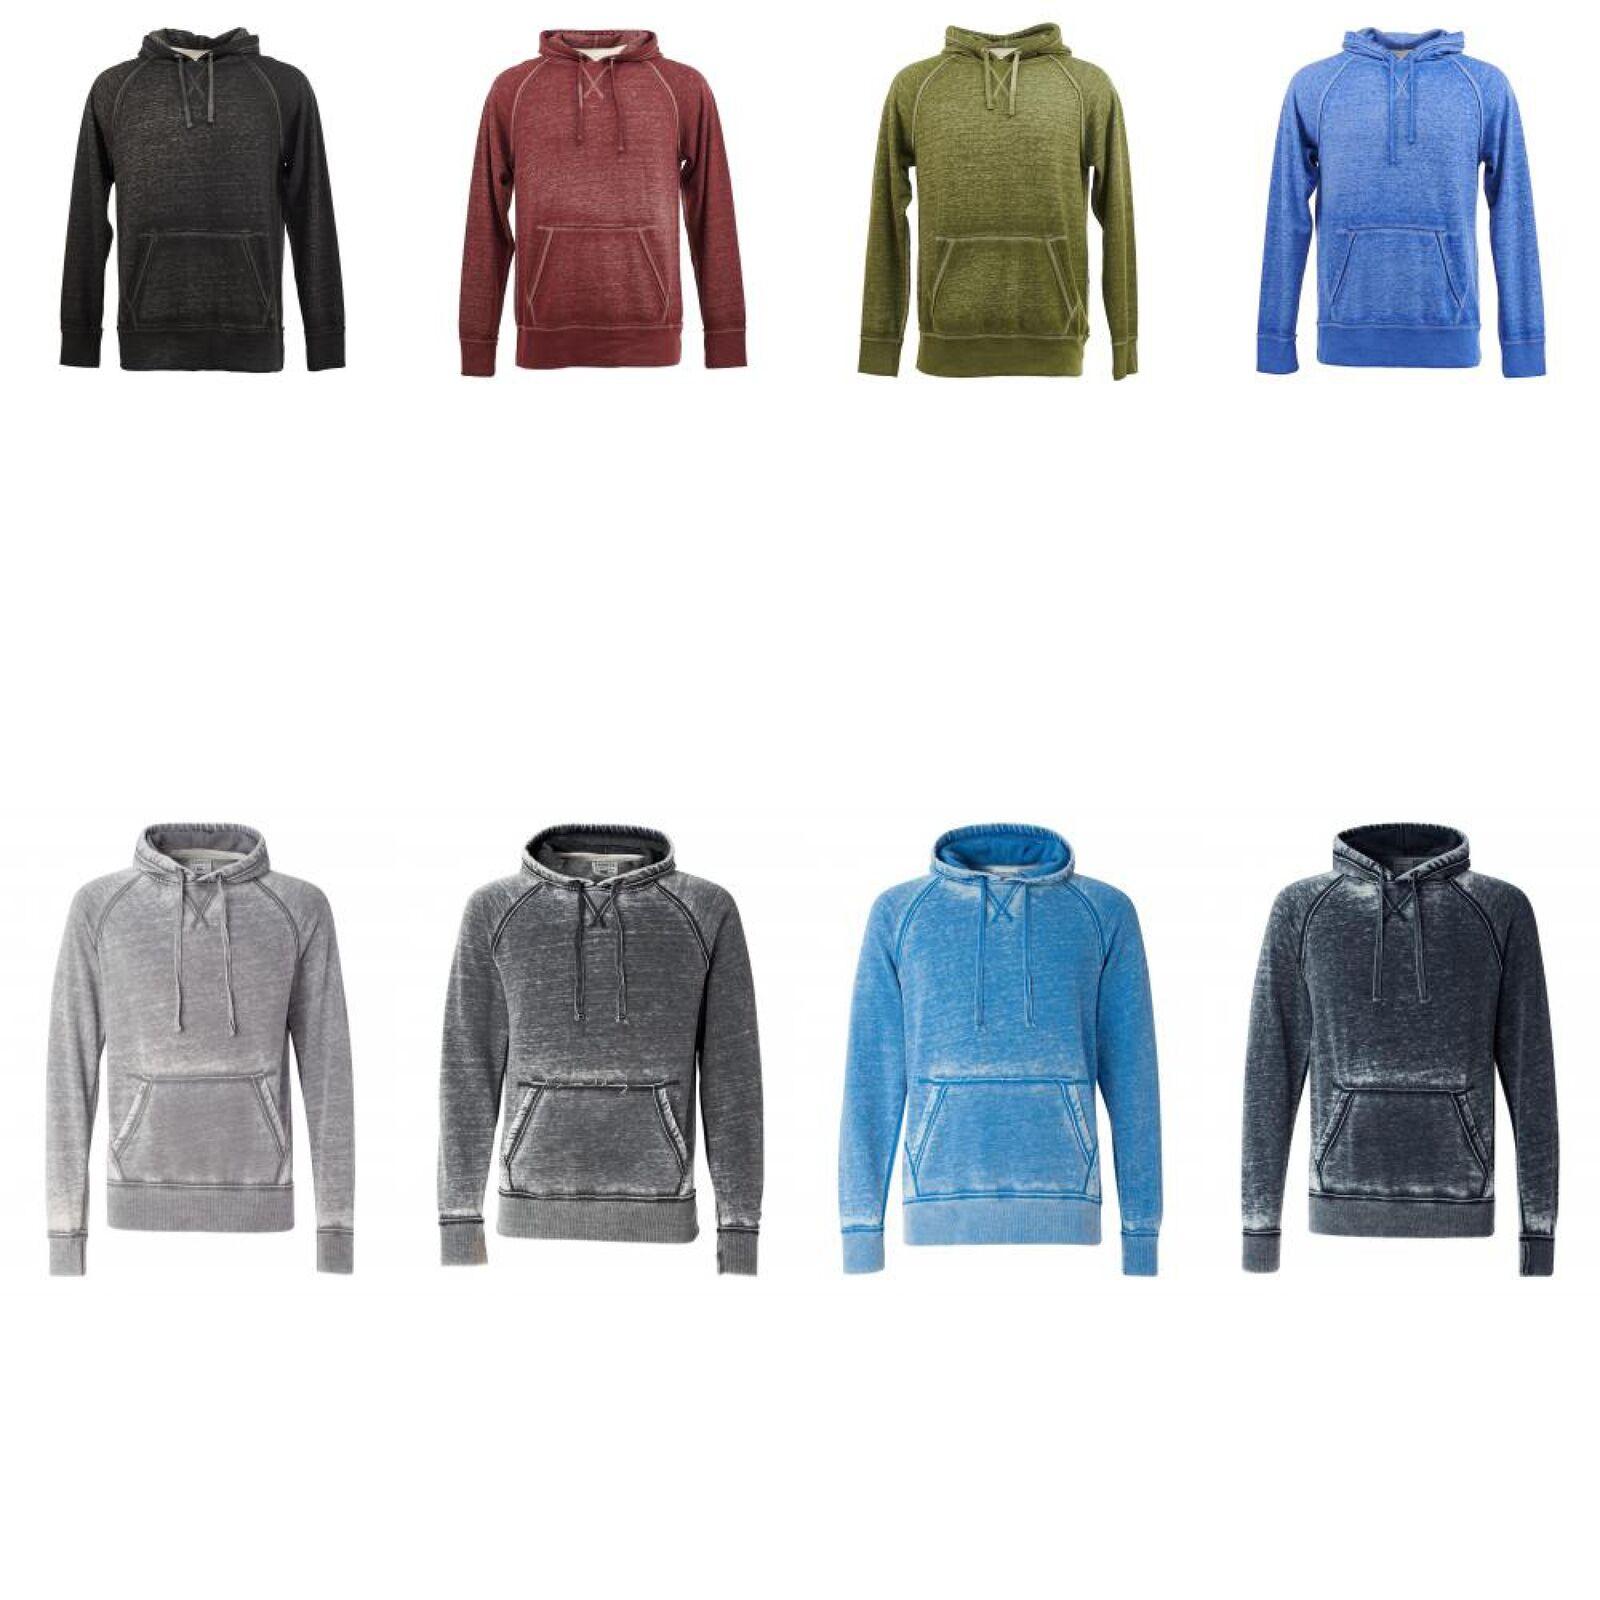 Details about J. America Vintage Zen Hooded Pullover Sweatshirt. 8915